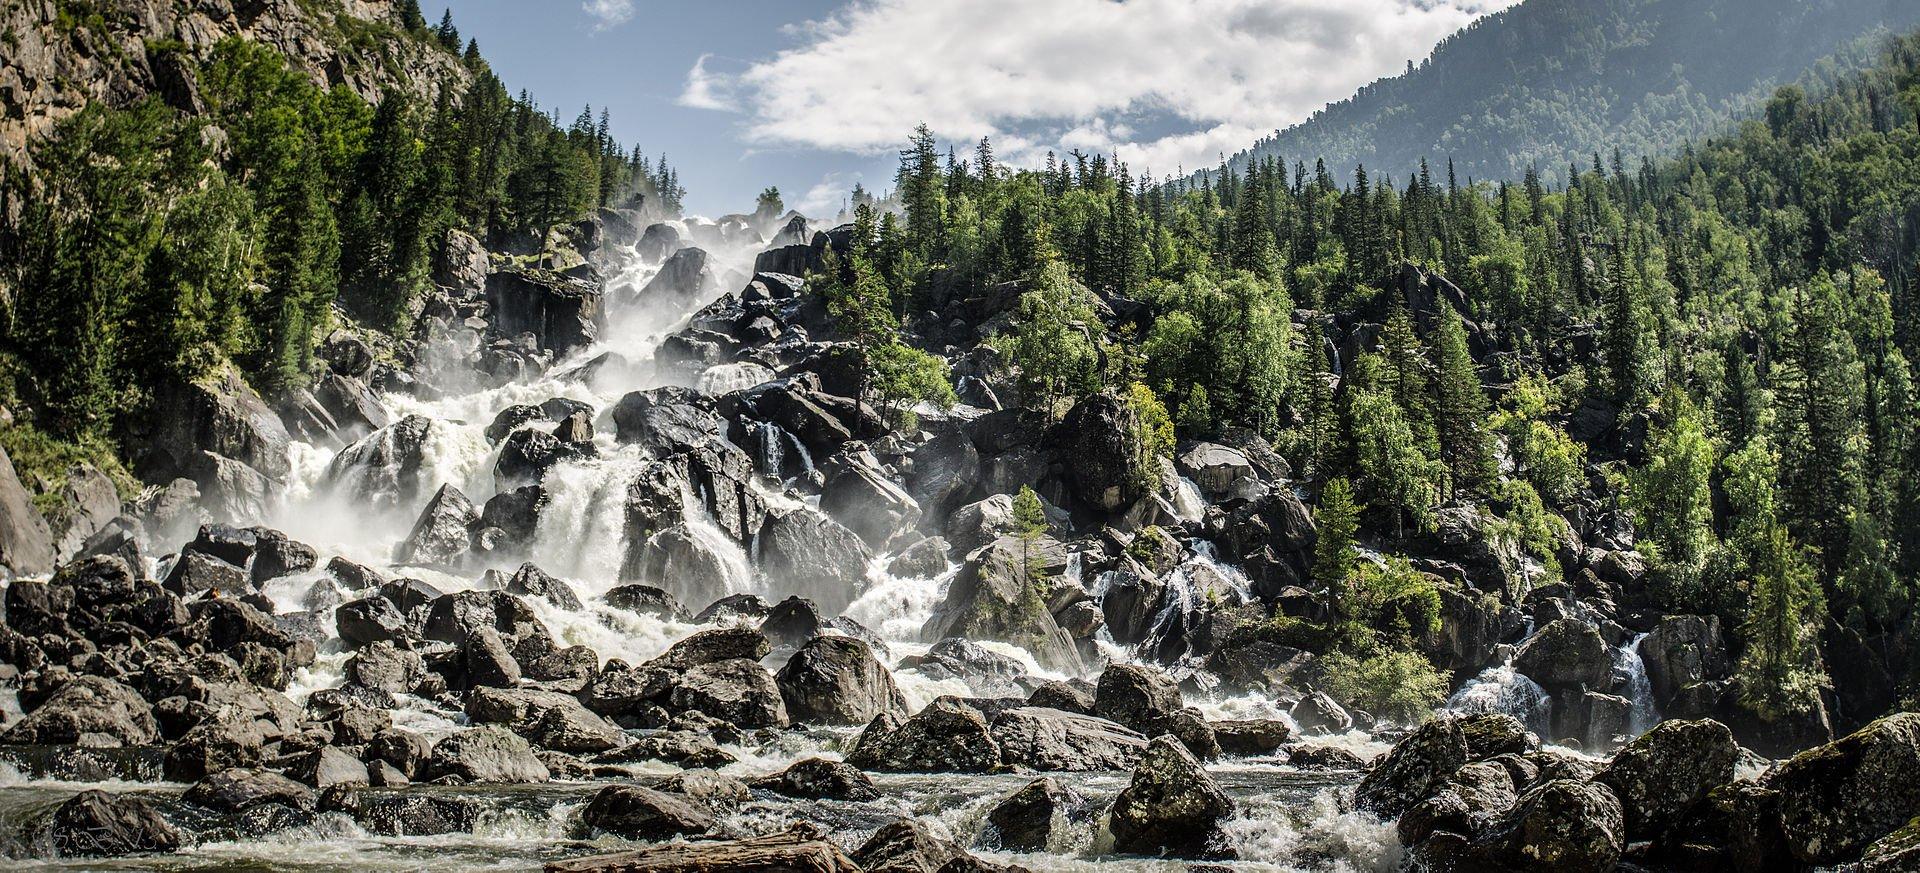 Алтай. Водопад Учар - Чульчинский